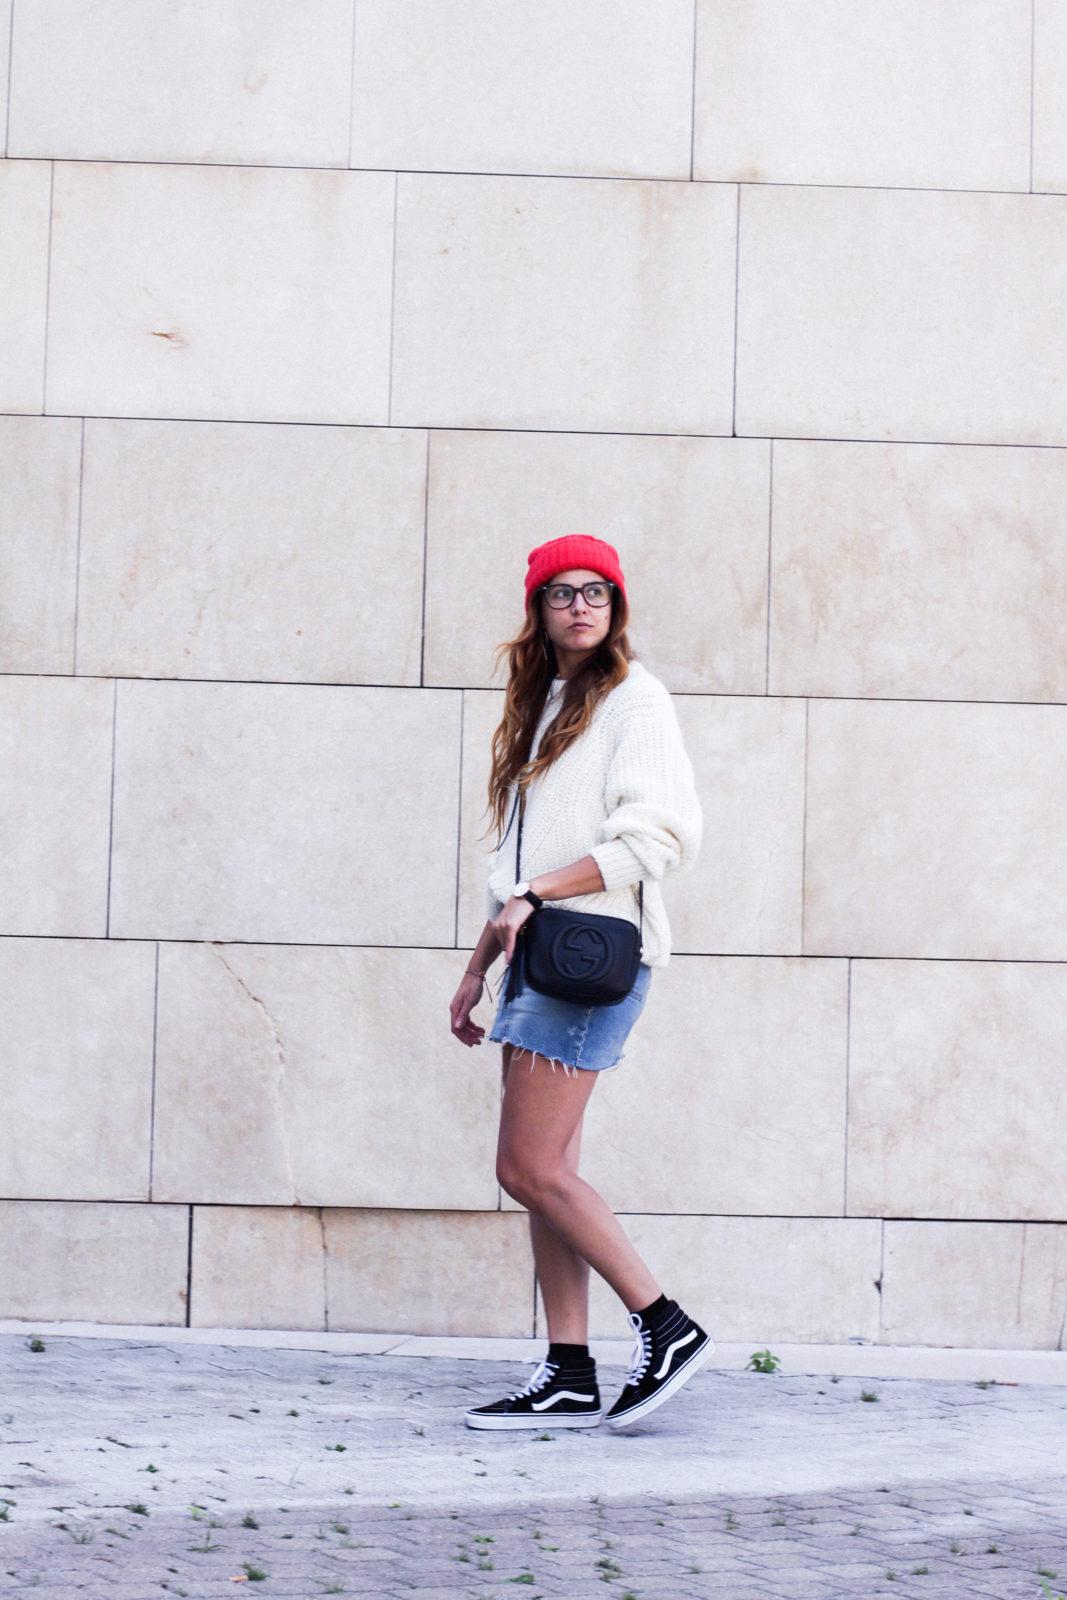 vans_falda_vaquera_sweater_beanie_bilbao-32